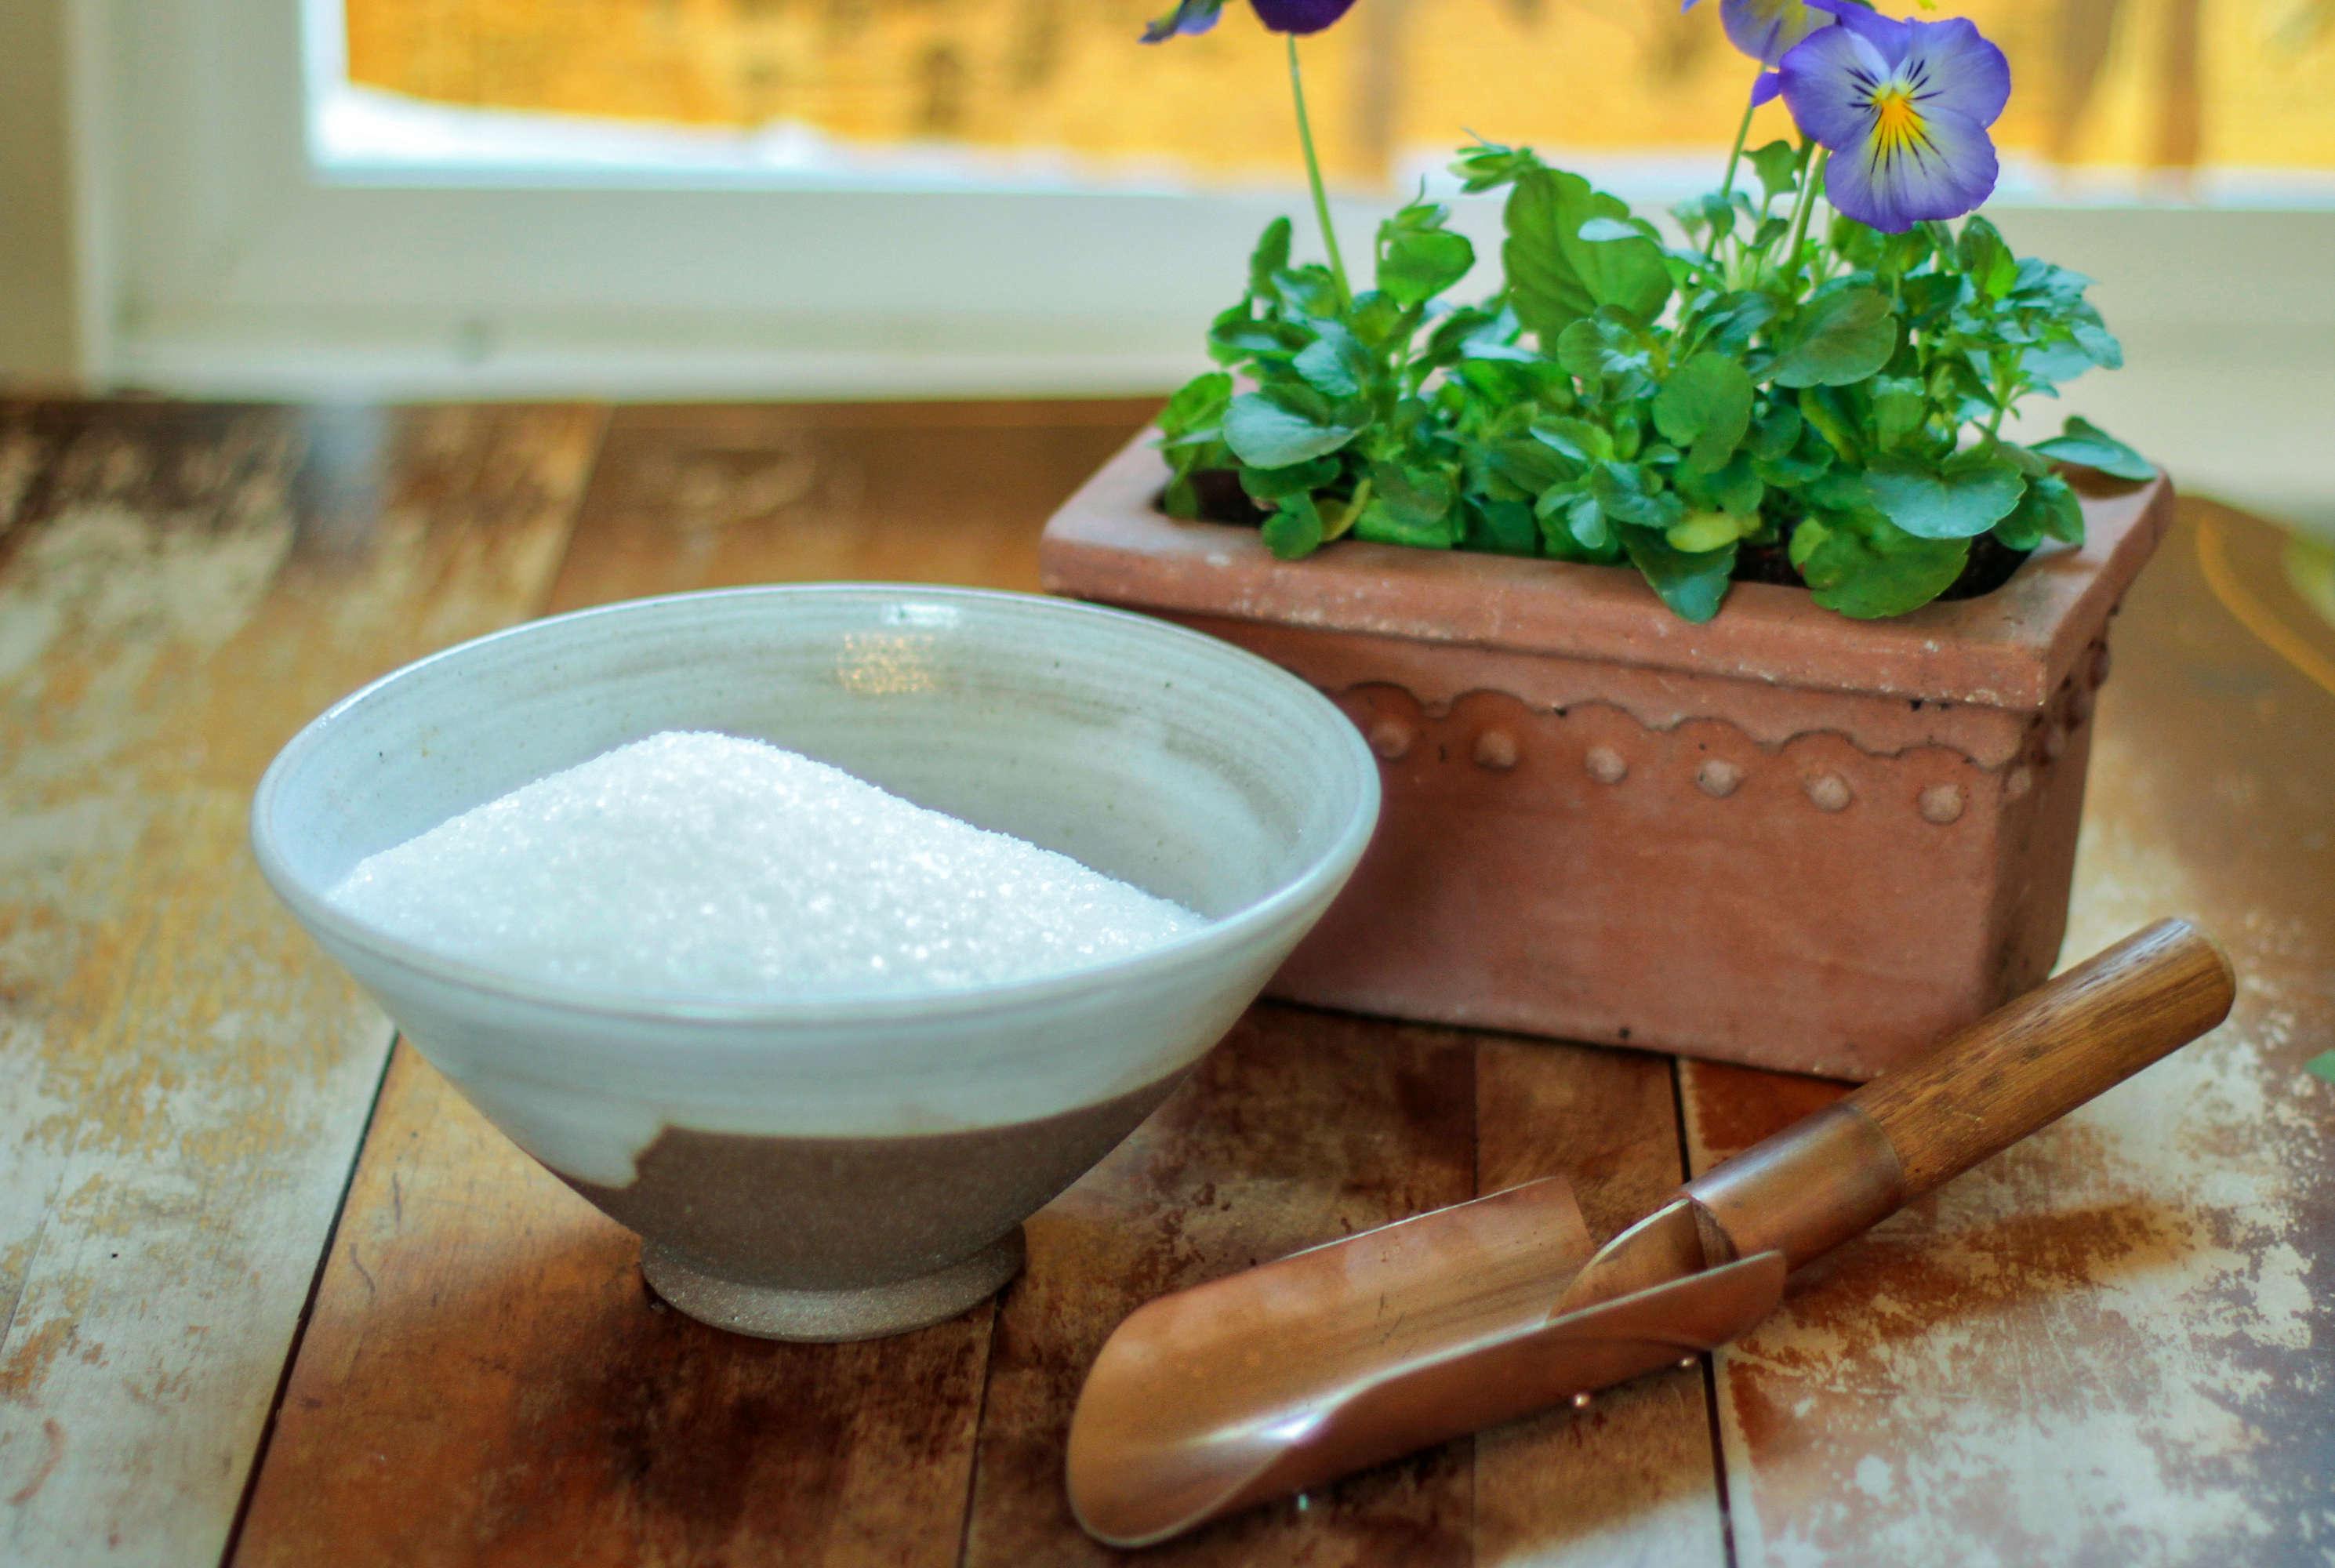 Gardening 101: How to Add Epsom Salts to Soil - Gardenista